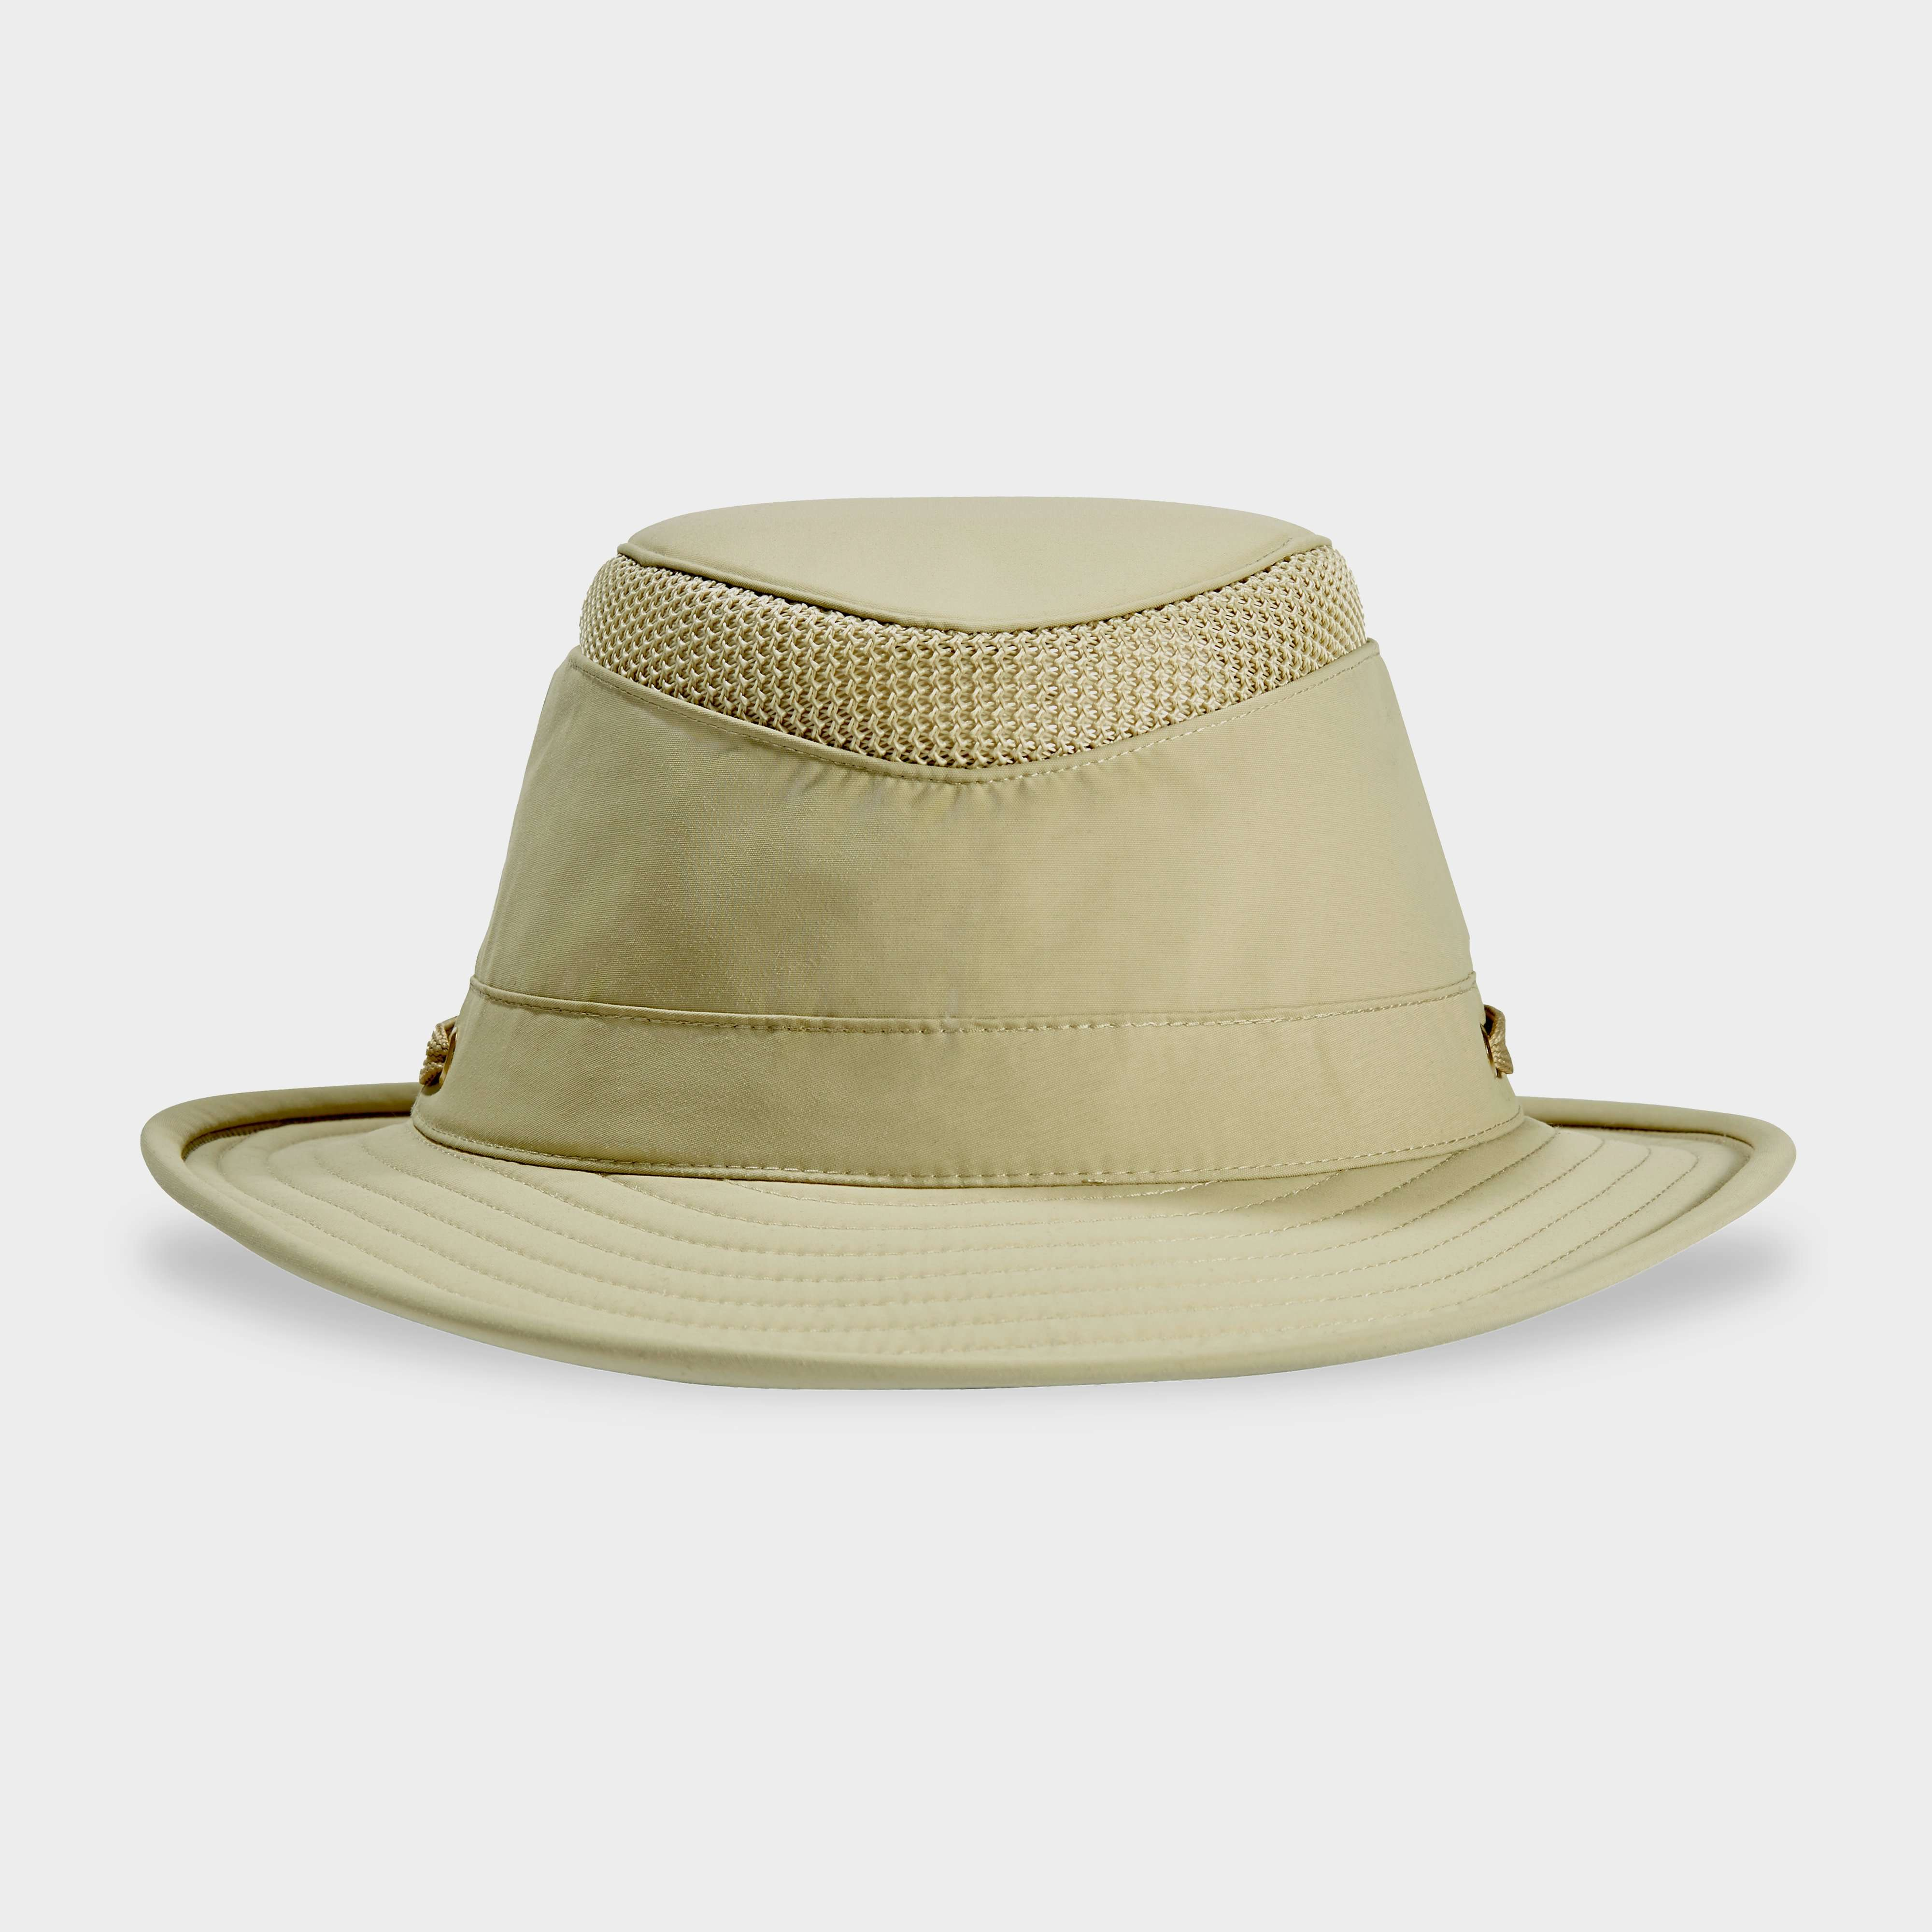 TILLEY Unisex LTM5 AIRFLO® Hat